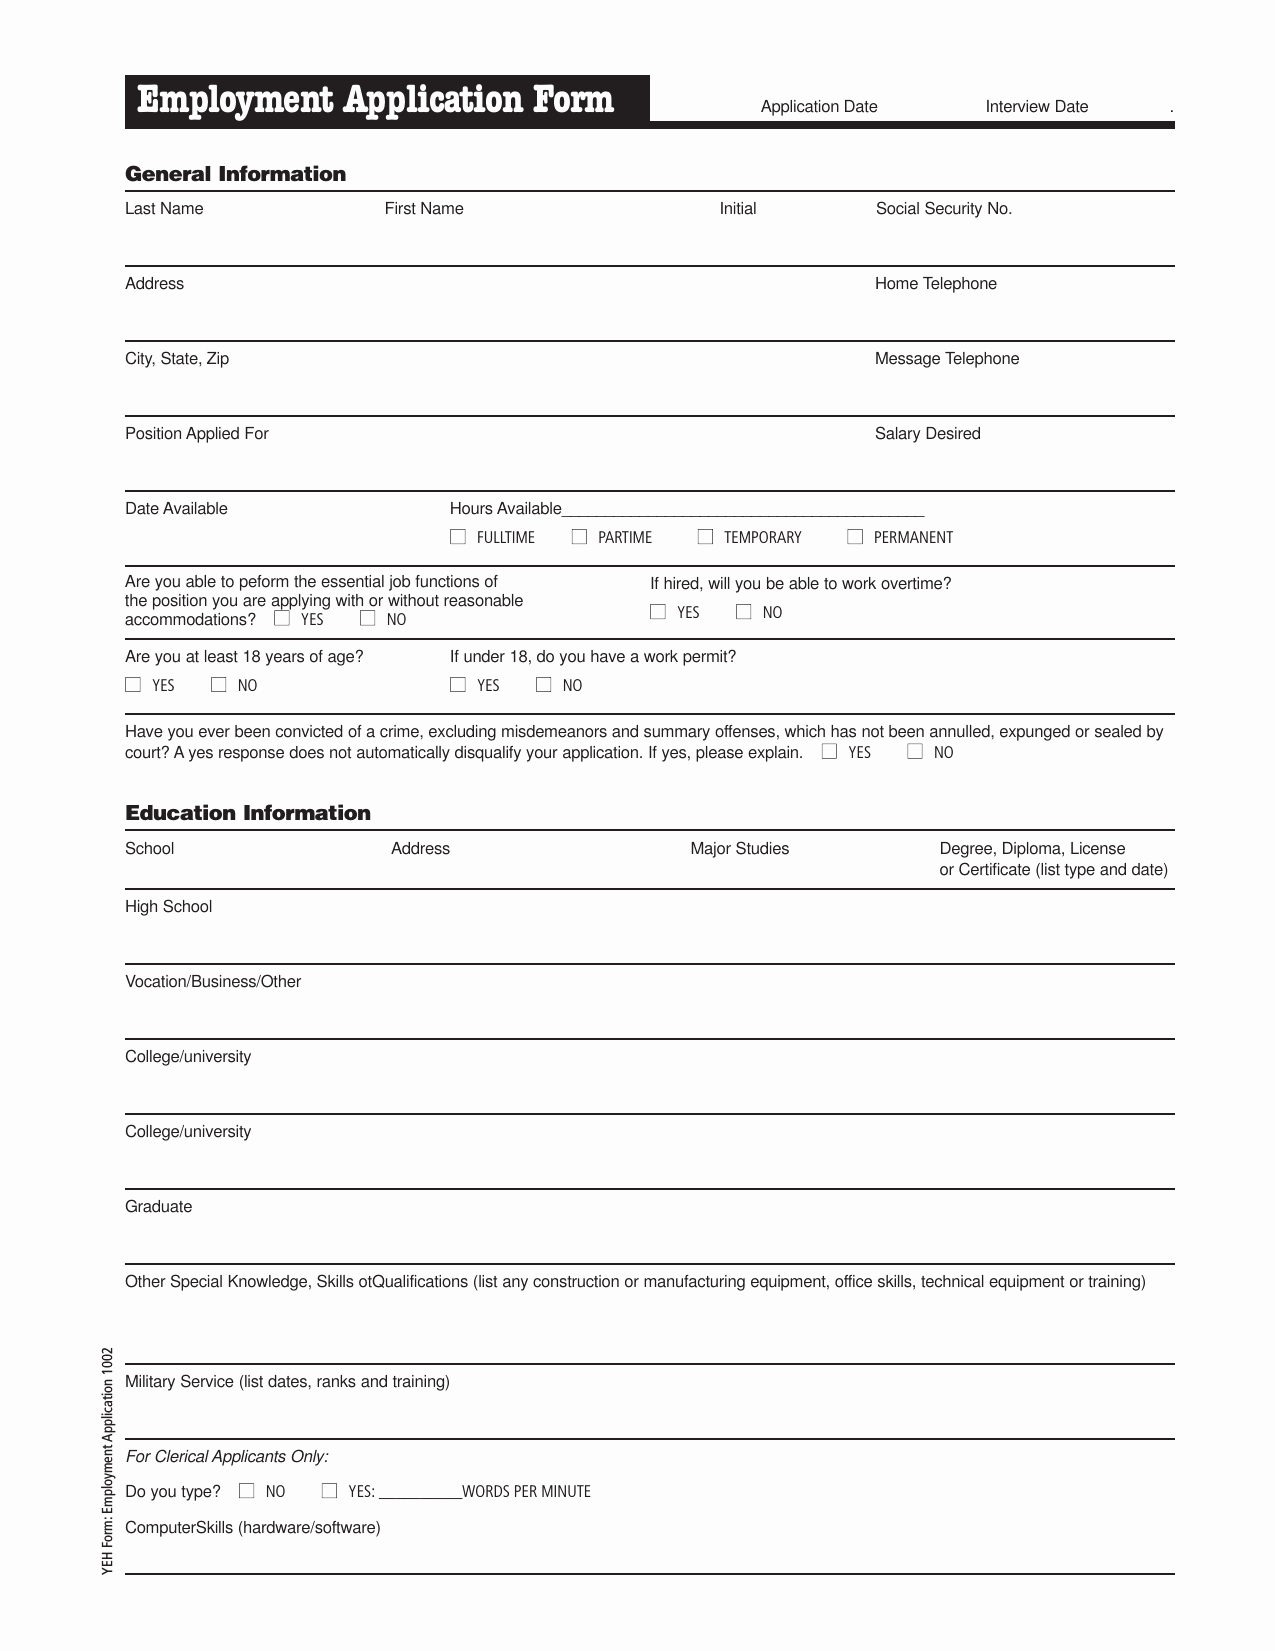 meijer job application form careers